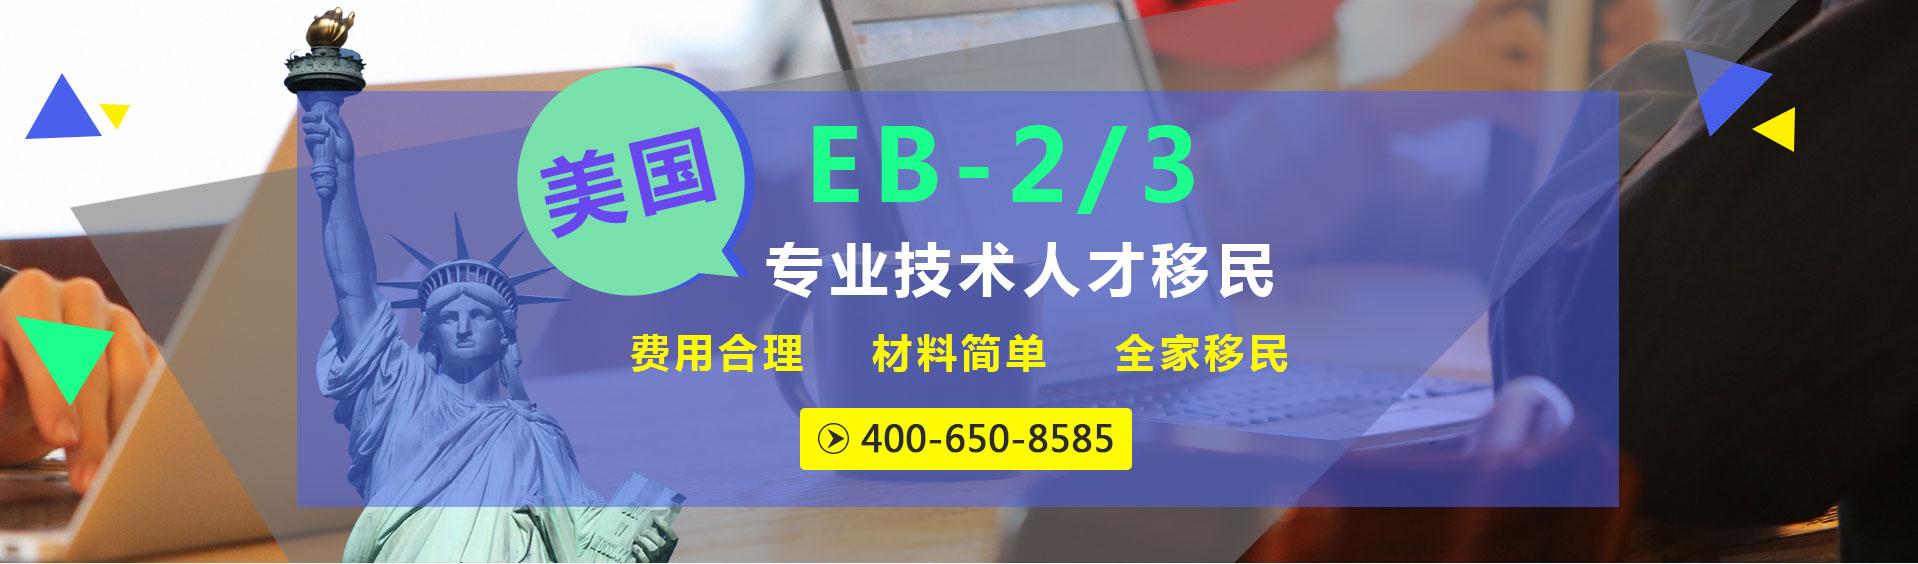 美国EB-2/3